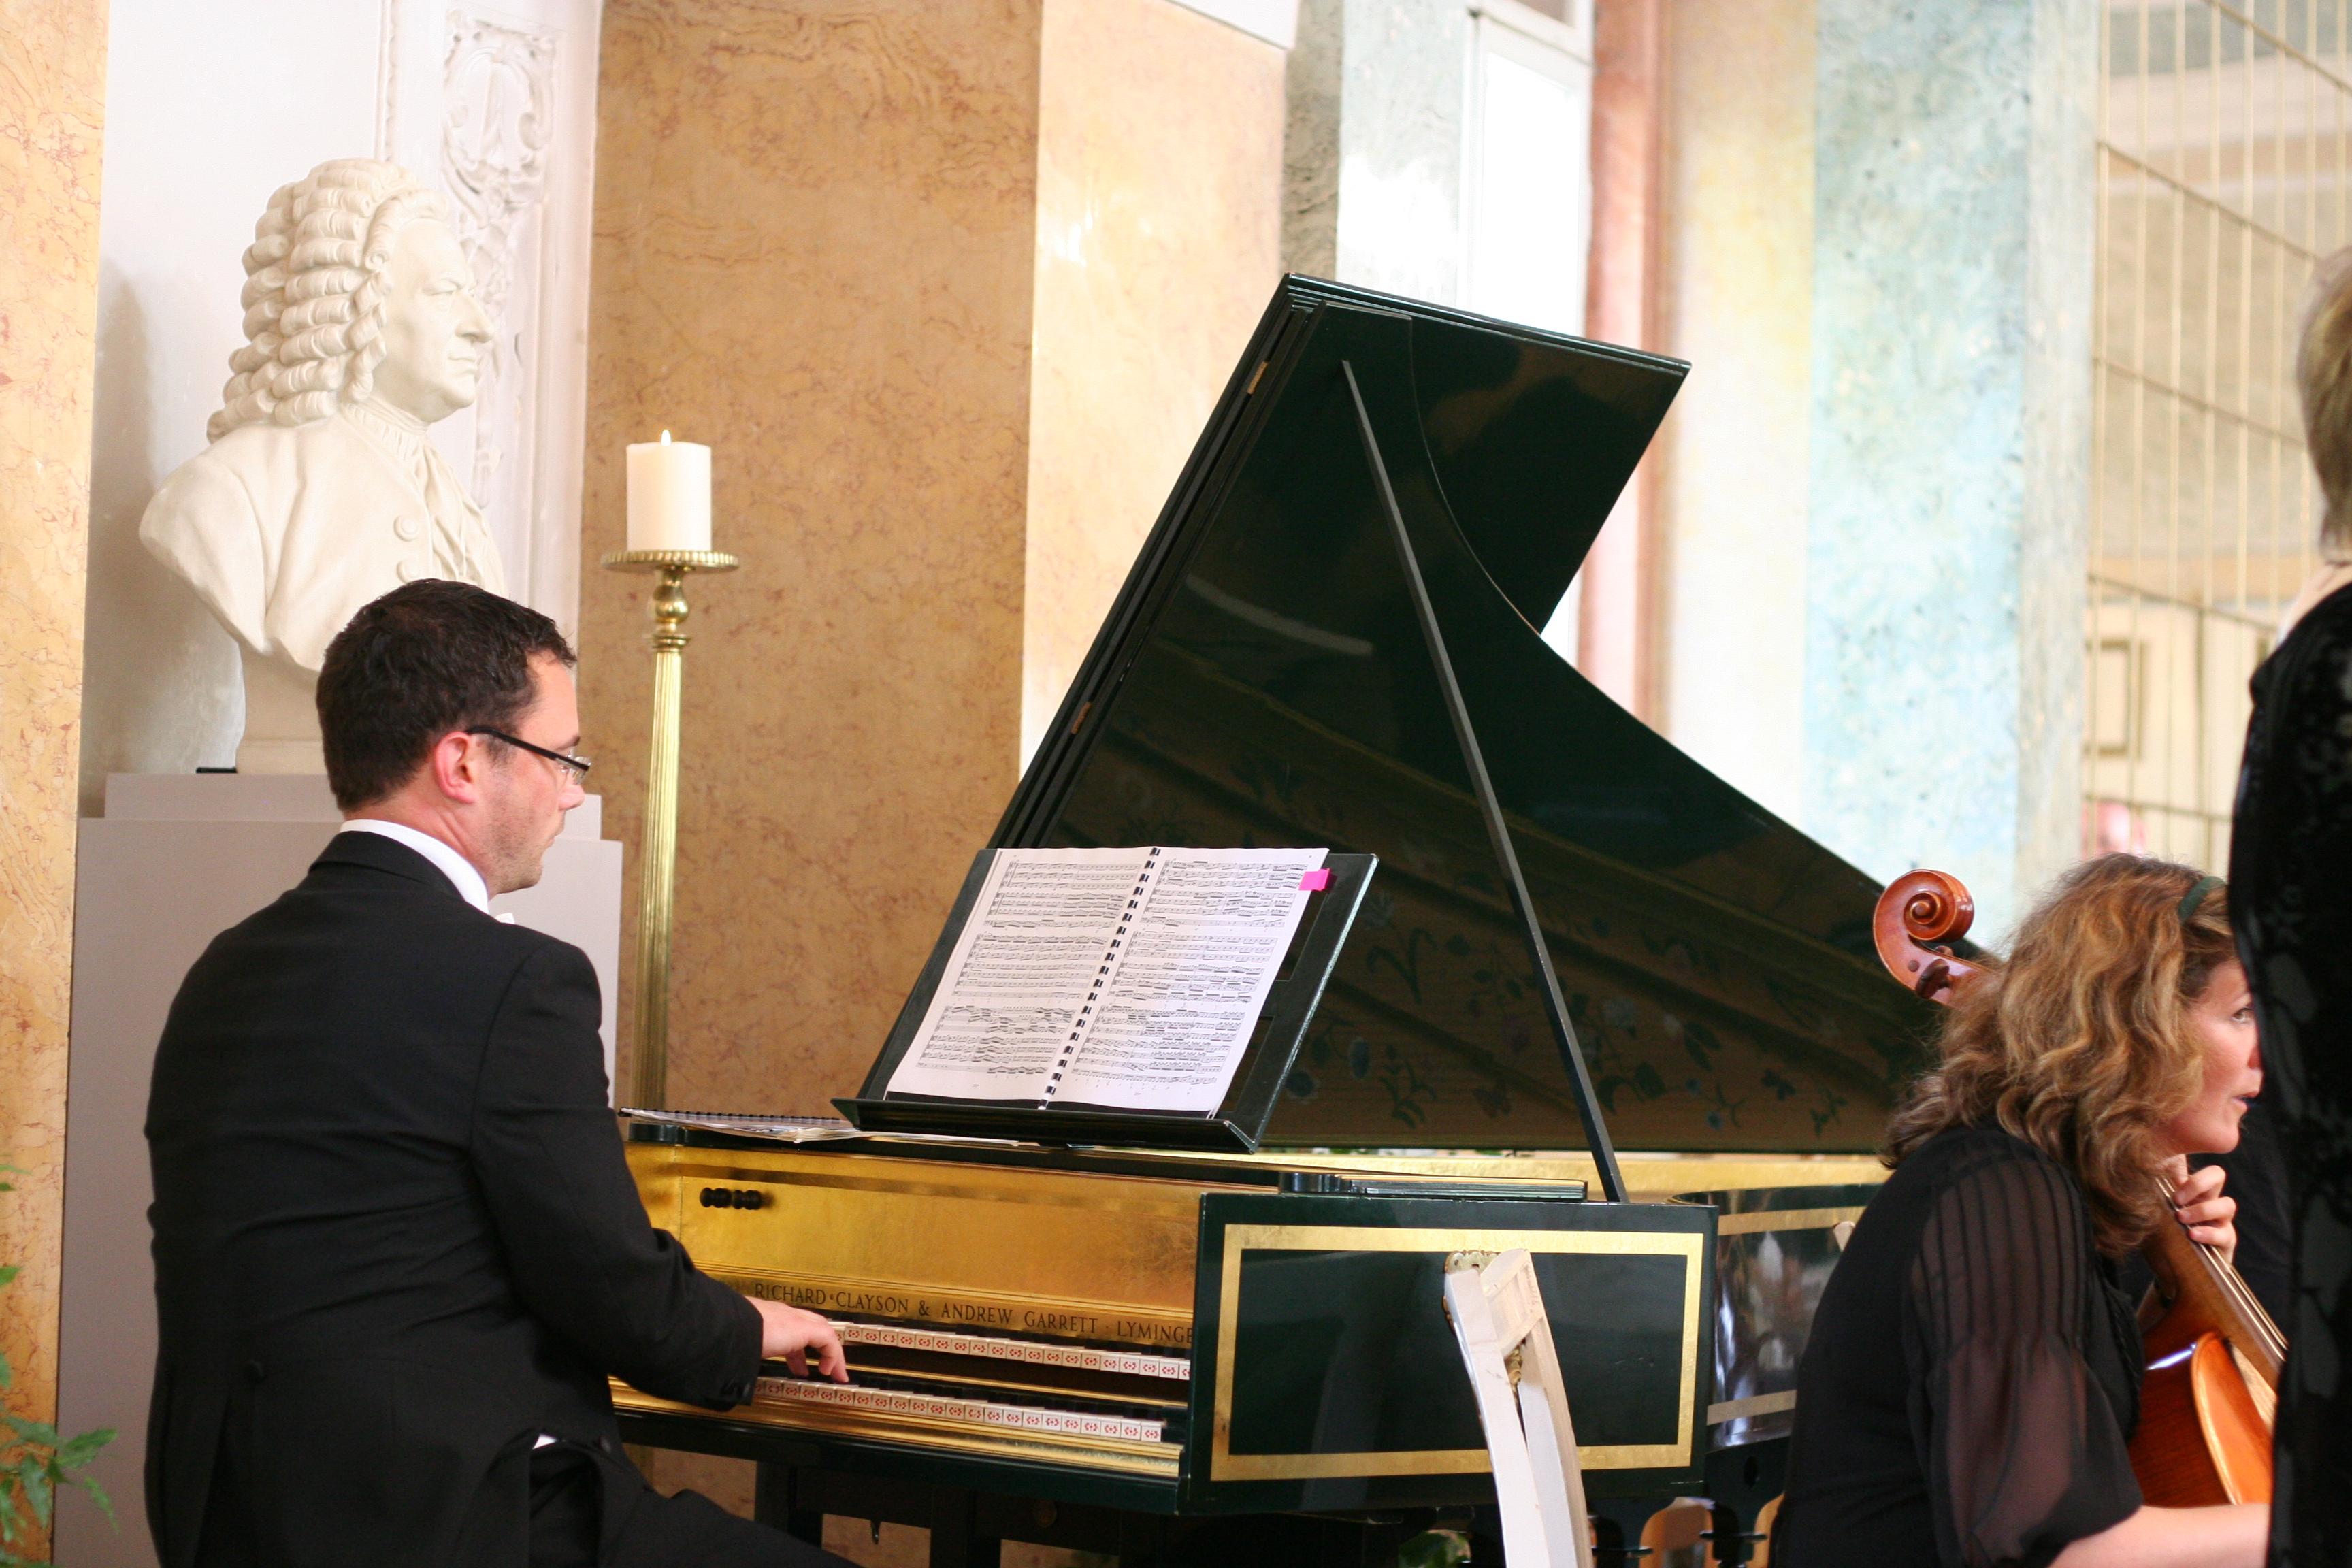 Konzert zum Bachfest 2008 unter der Bach-Büste im Spiegelsaal Schloss Köthen (Sachsen-Anhalt) Germany